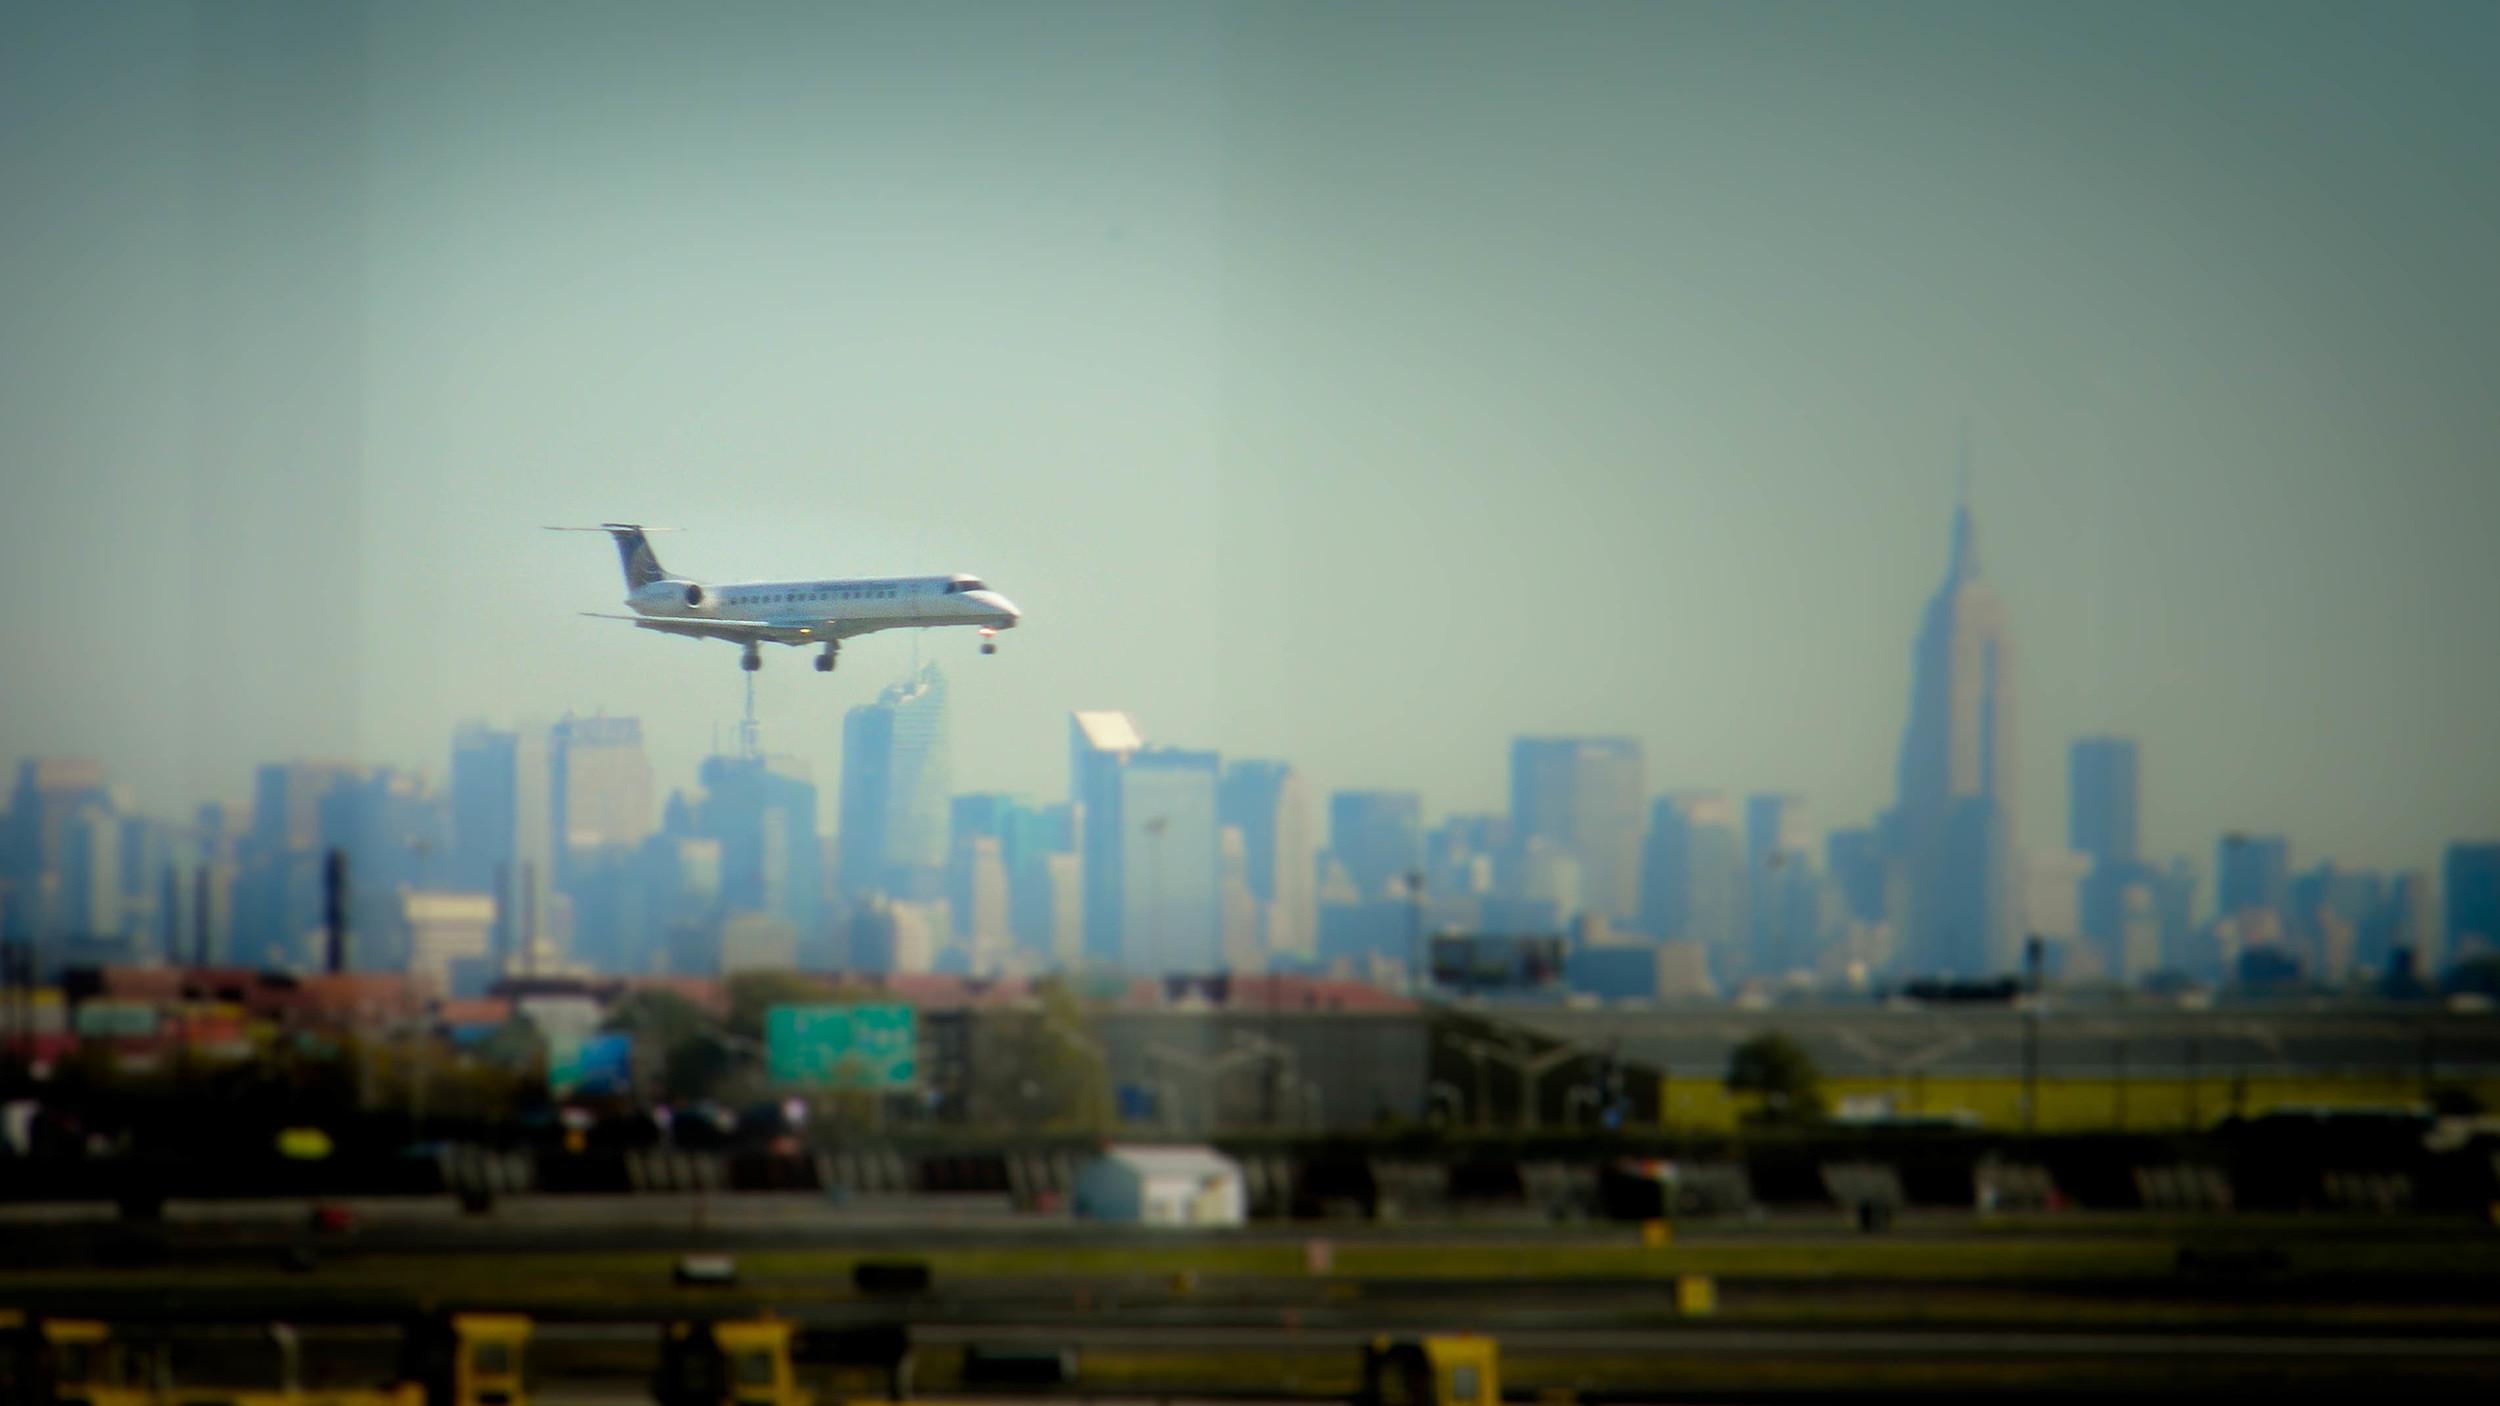 Landing: After